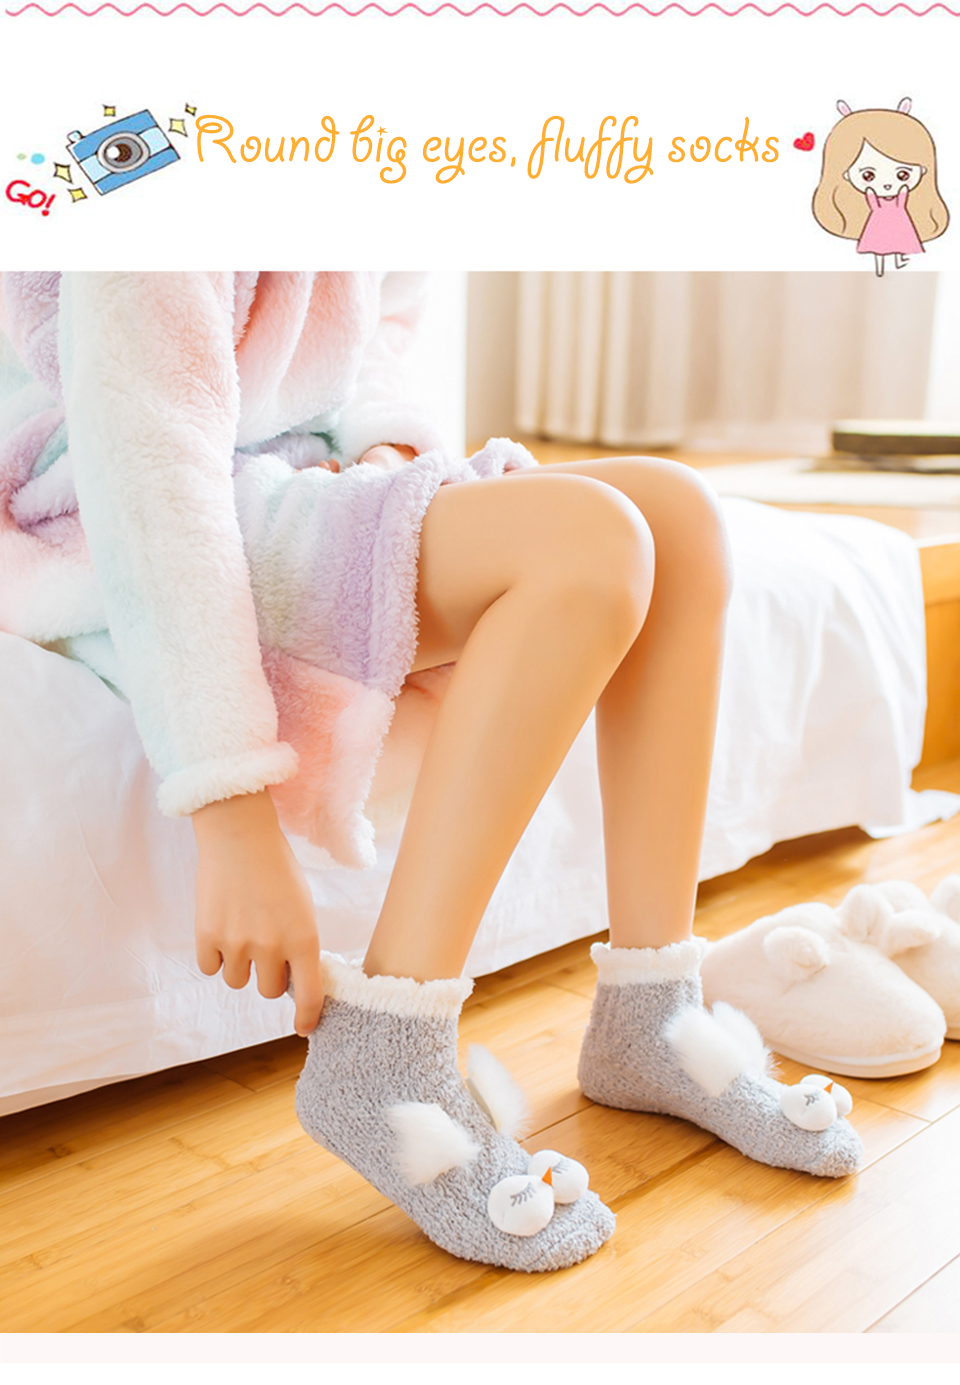 Autumn And Winter Coral Velvet Sleep Sock Female Tube Thickening Warm Round Big Eyes Home Non-Slip Towel Cute Girl Floor Socks (1)